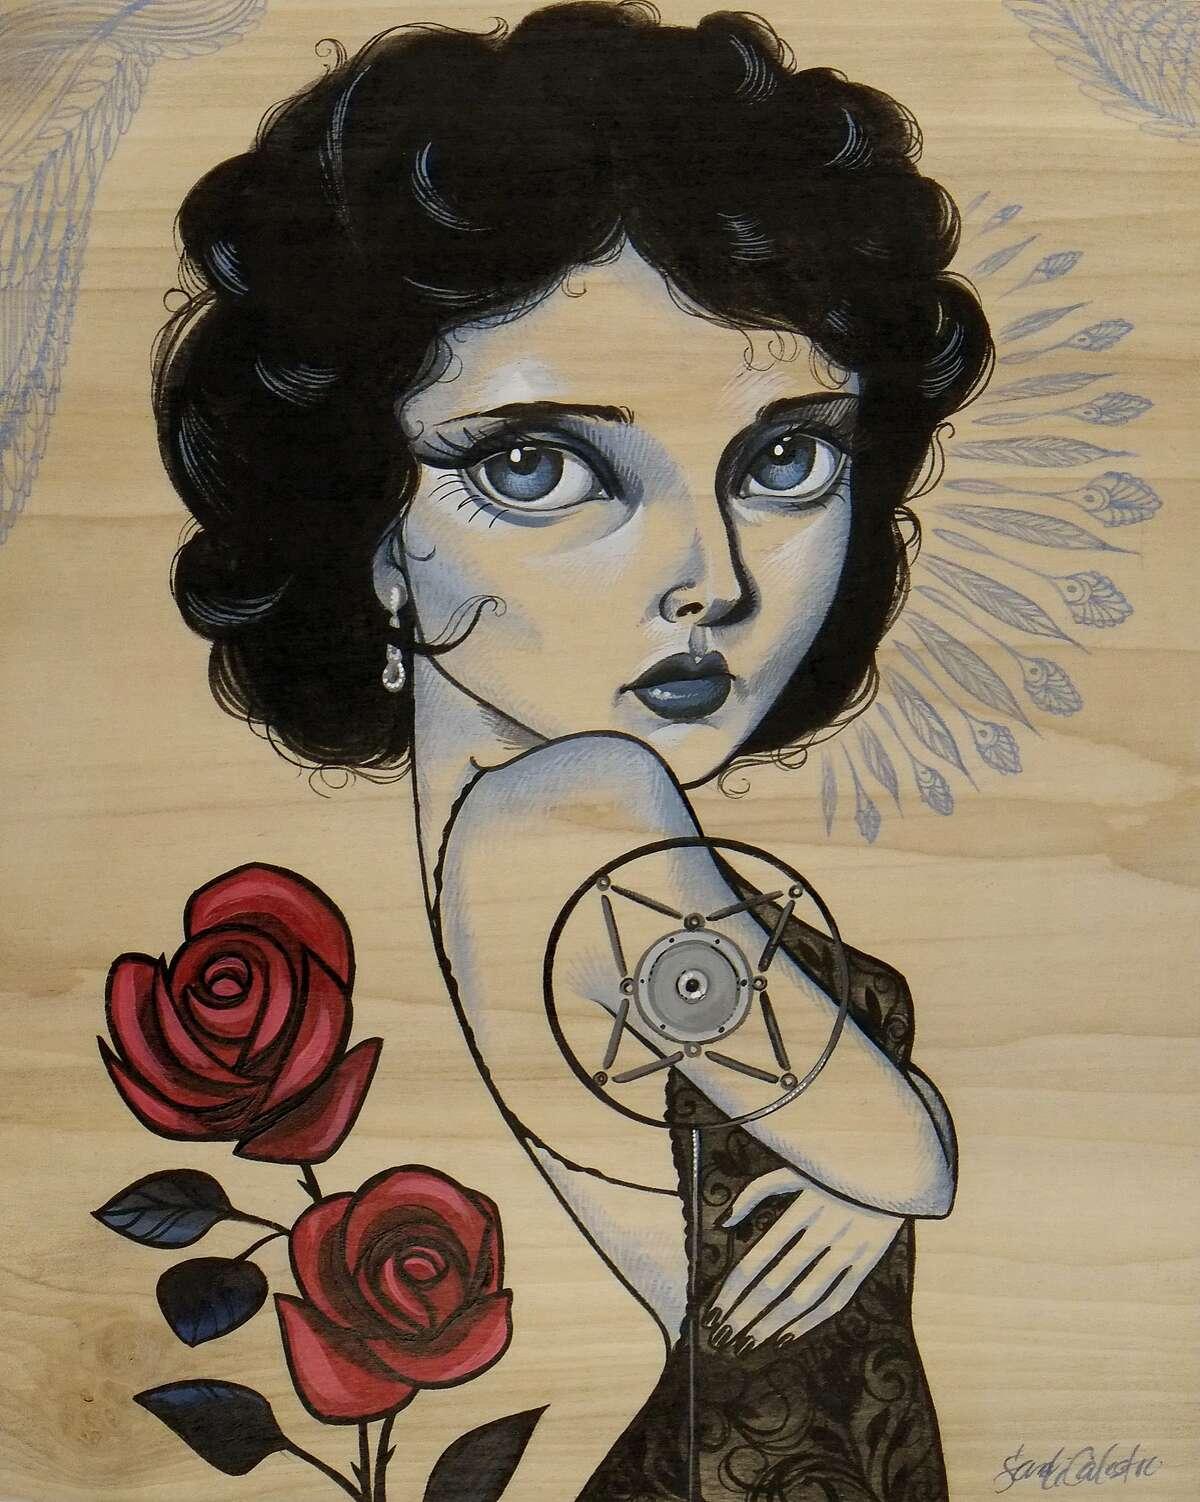 """Dorothy Vallens,"" by Sandi Calistro"